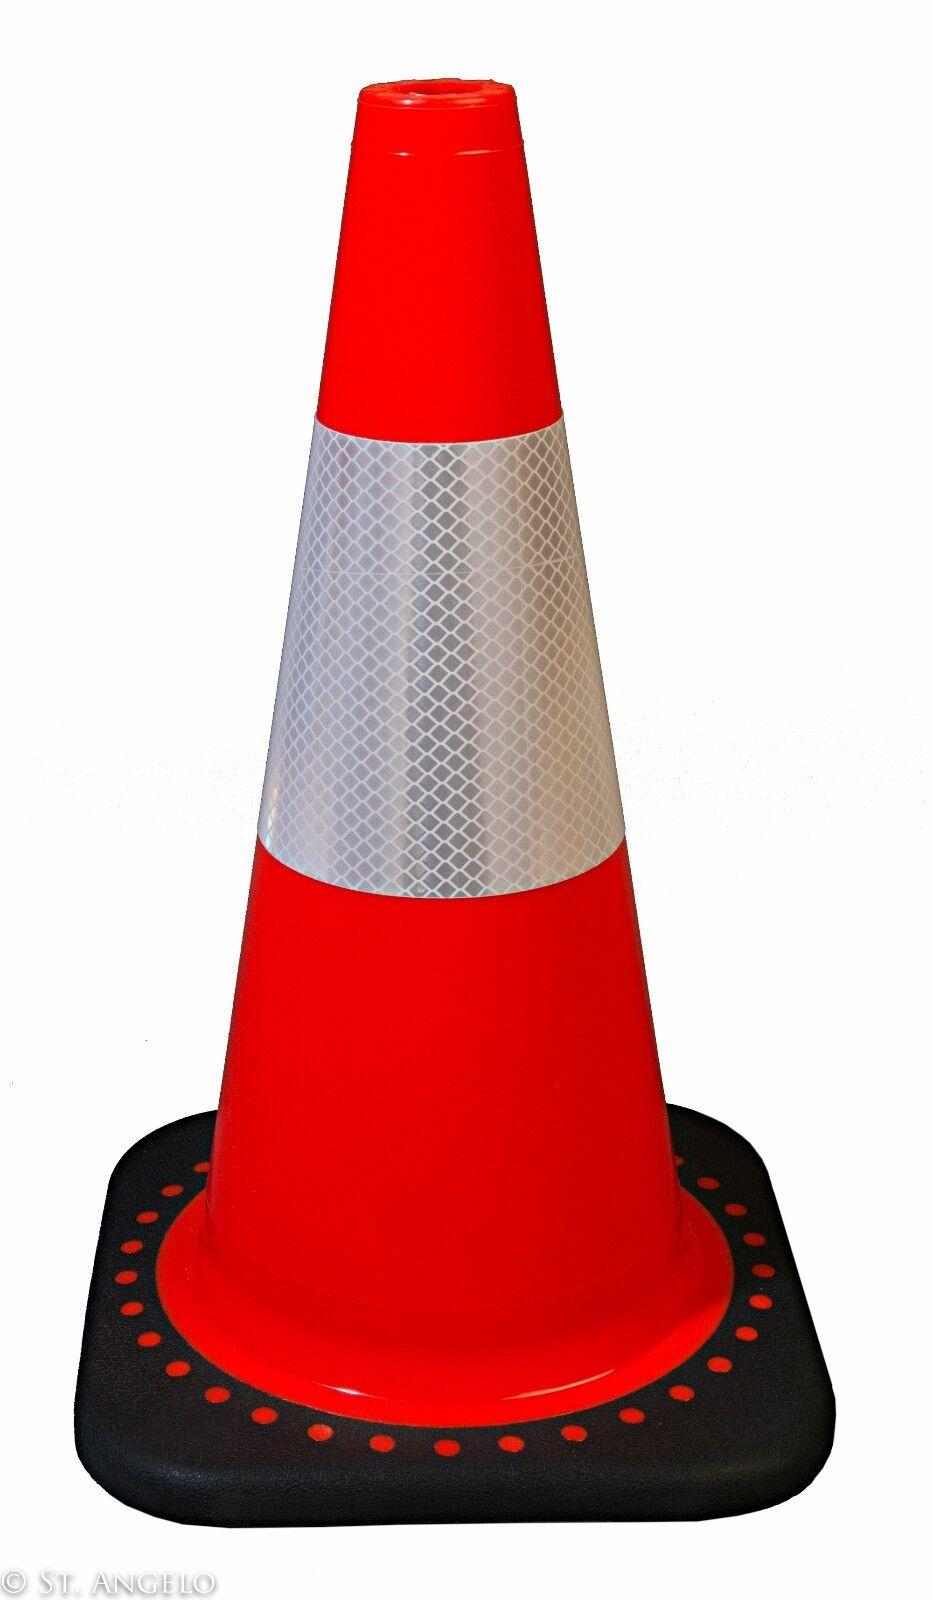 1850-6 18″ W/ 3M Reflective Stripe Orange Safety Traffic Cones 6/Pkg, Wide Body Business & Industrial